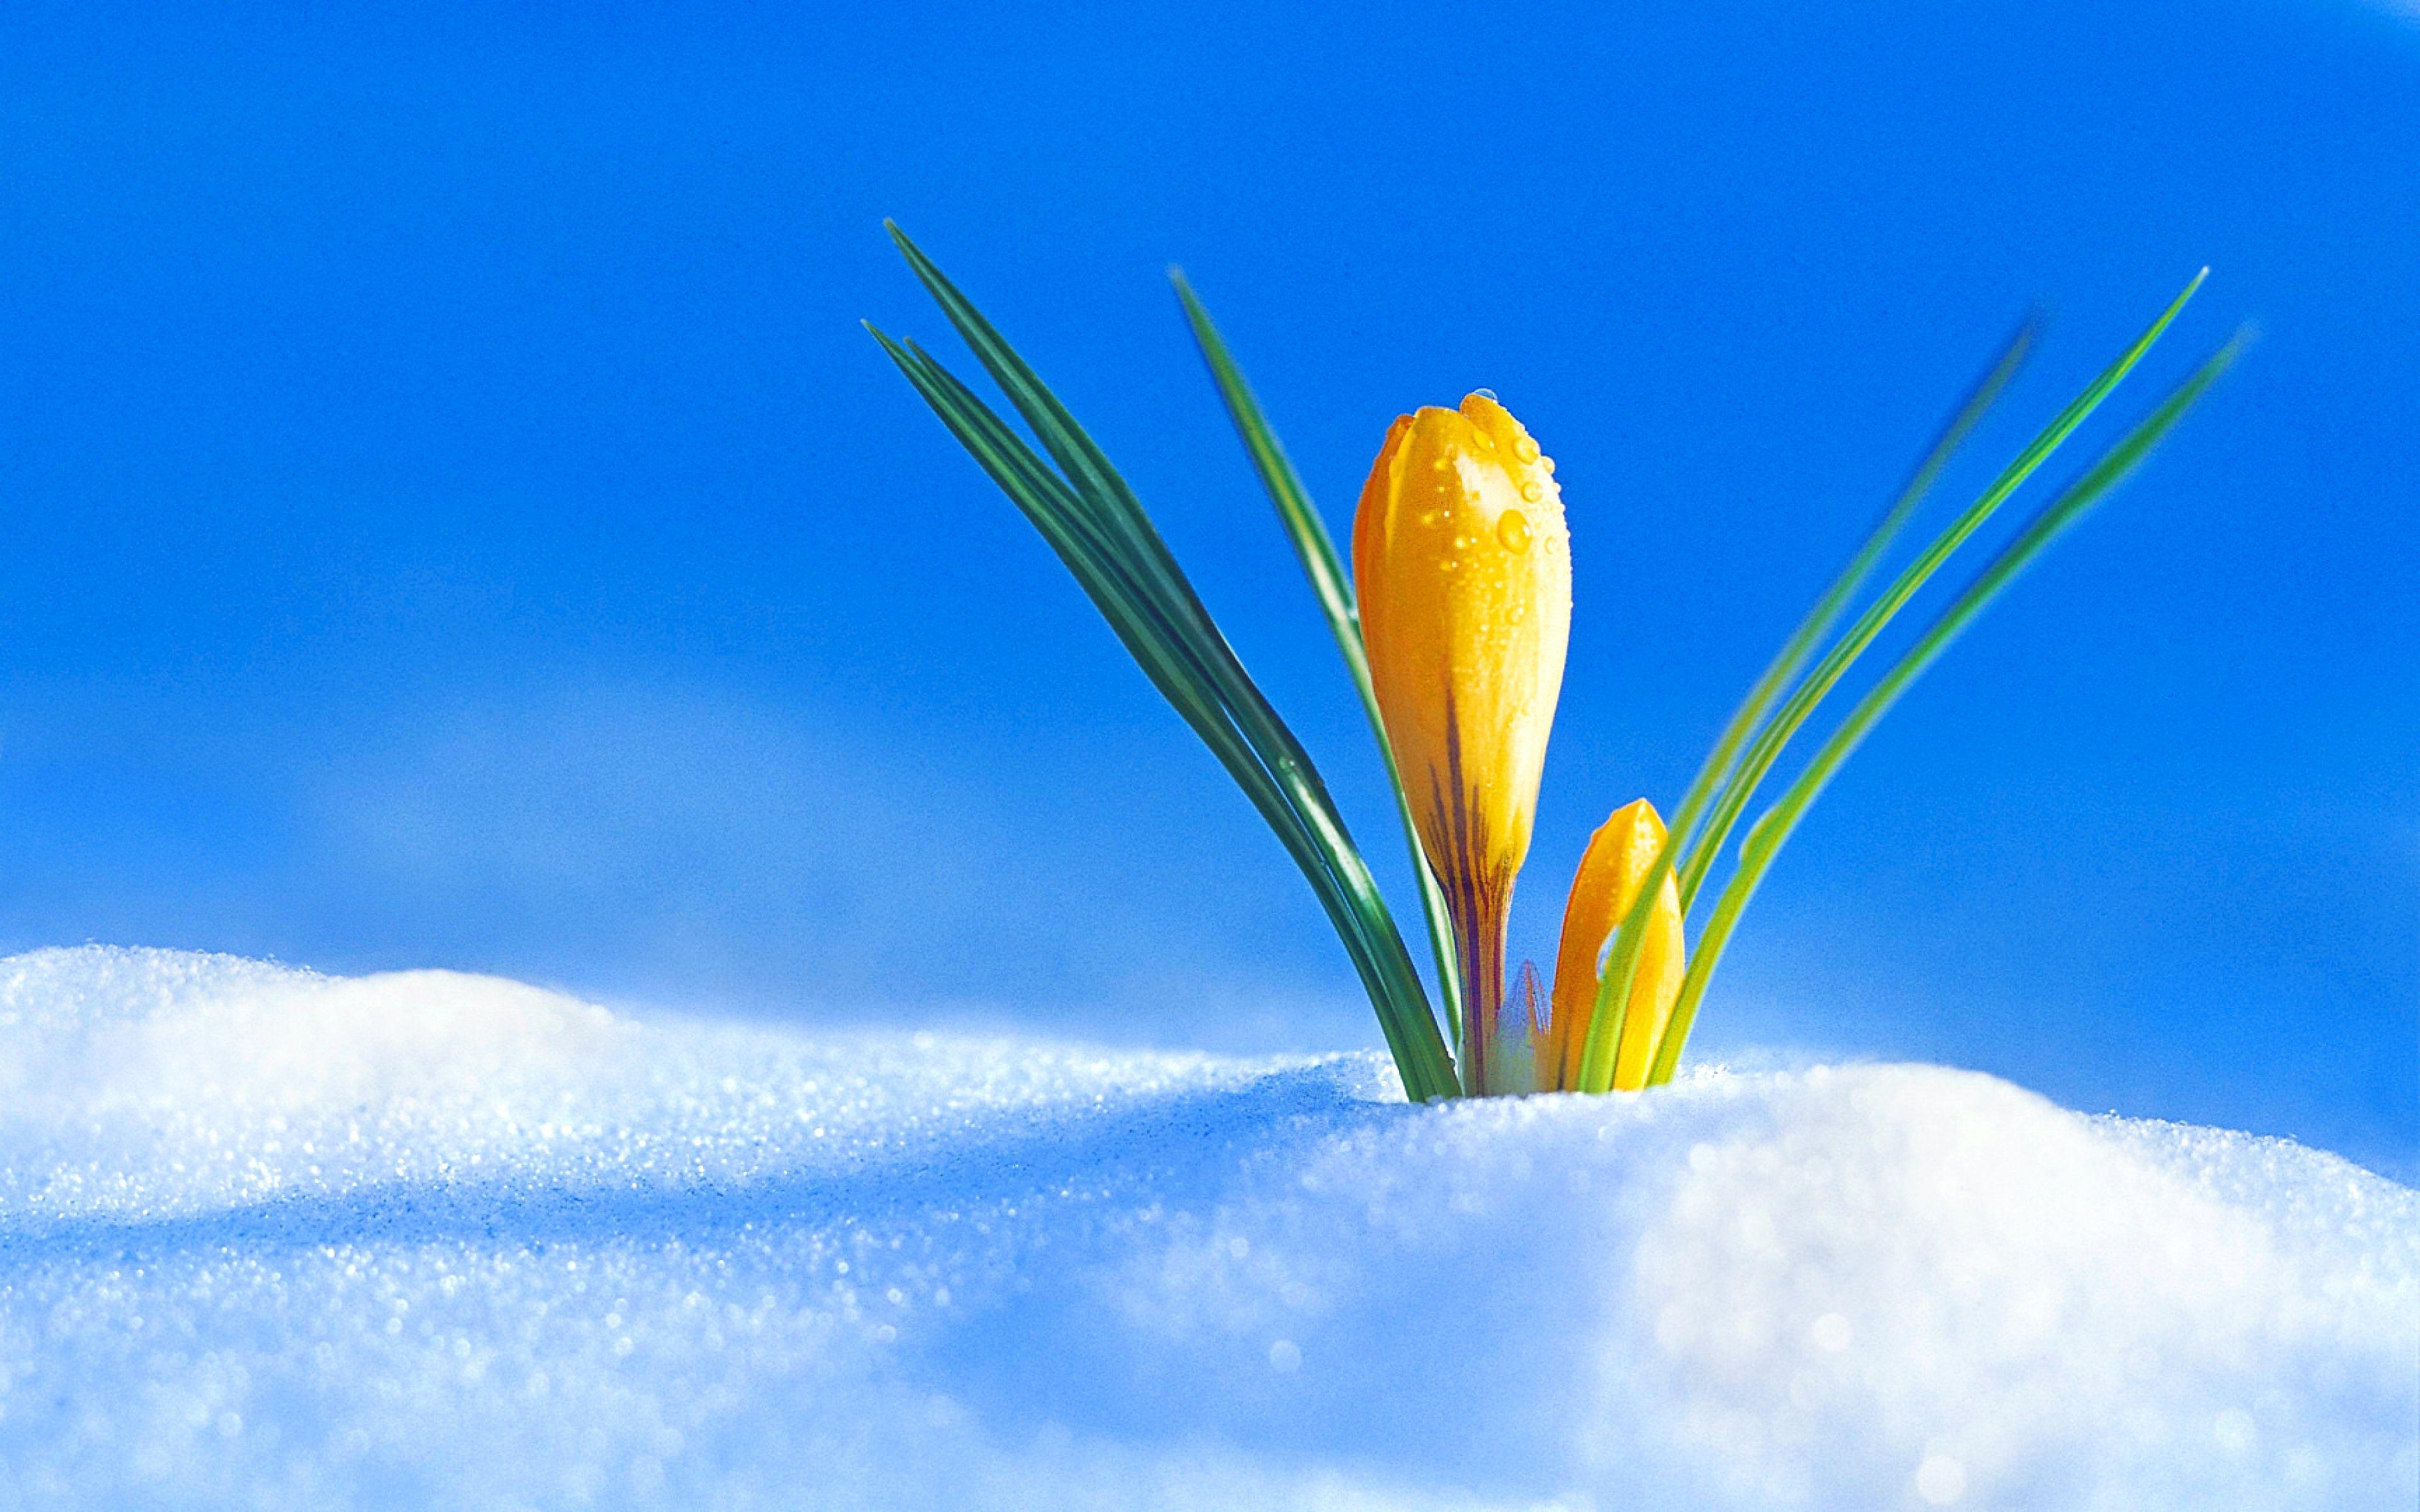 Flowers in Snow Wallpapers , Top Free Flowers in Snow